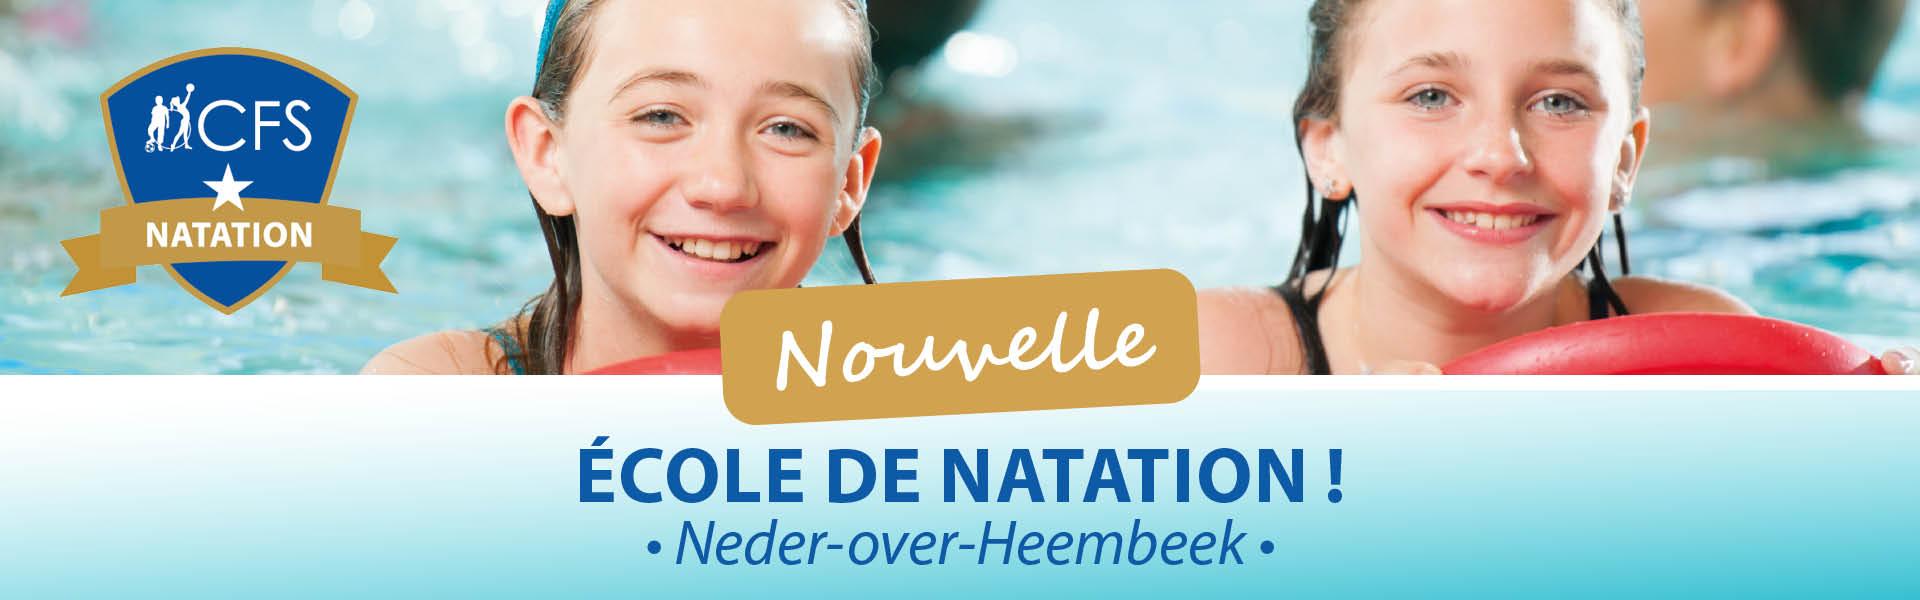 NEW - Neder-over-Heembeek